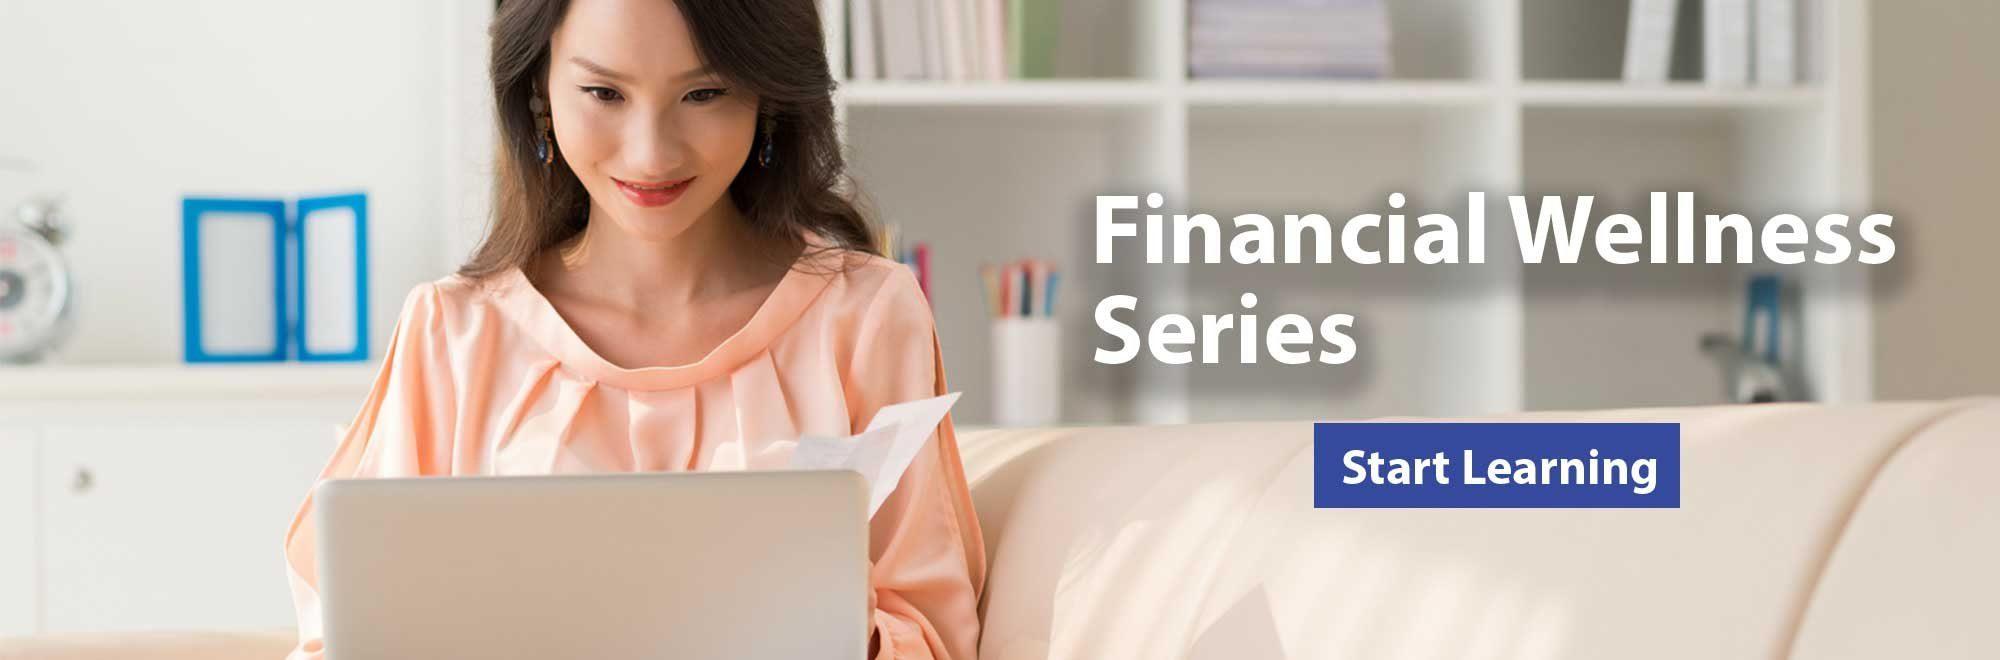 Financial Wellness Series. Start Learning.